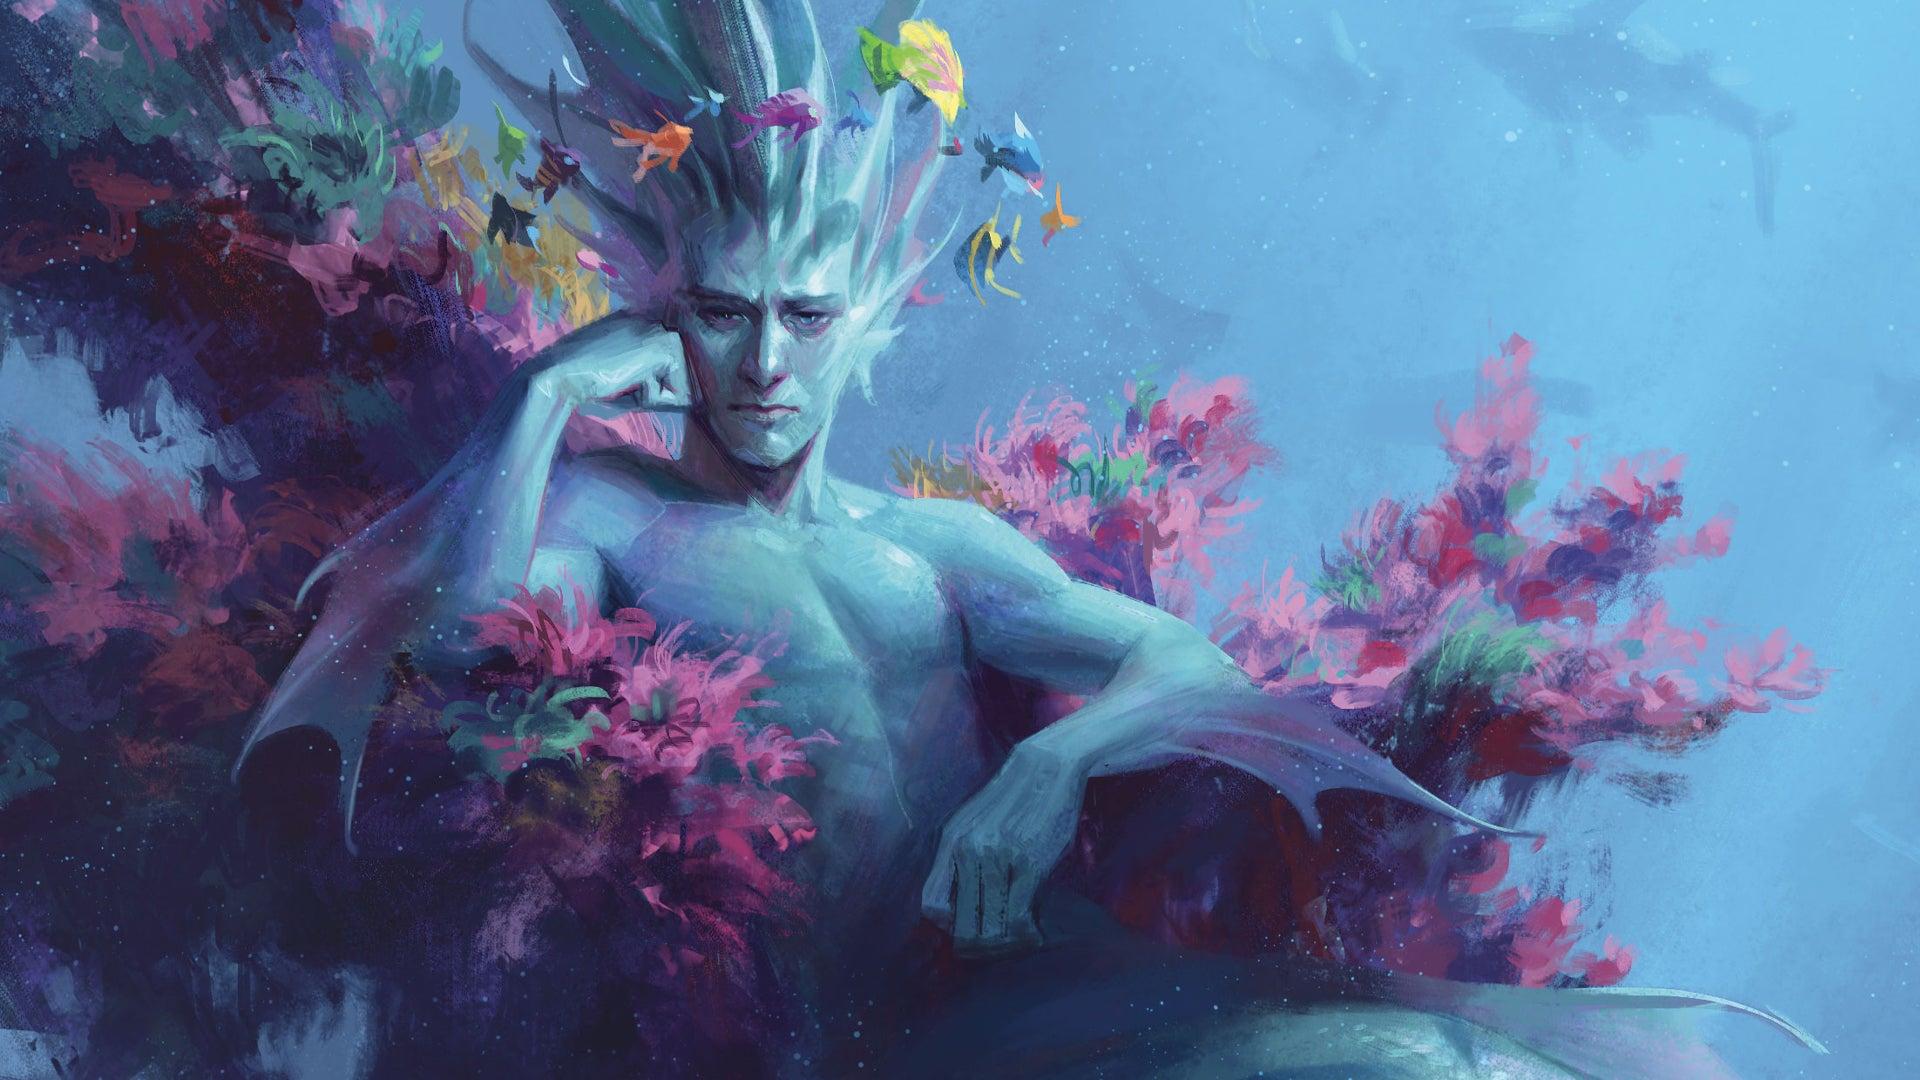 Tasha's Cauldron of Everything D&D RPG artwork 5